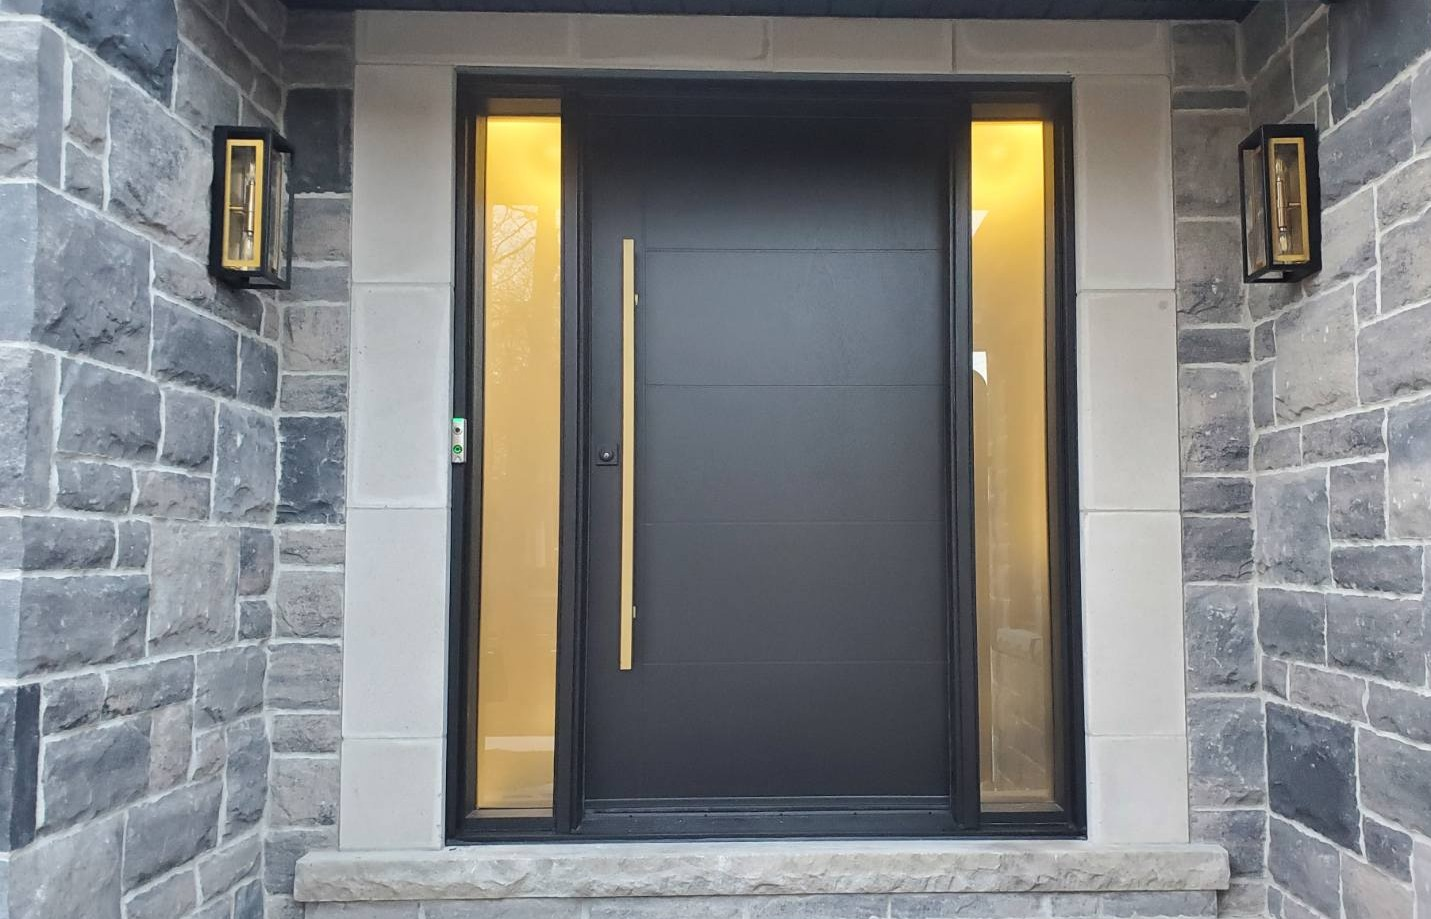 Fiberglass and Steel Door Installation and Replacement, PVC Windows Woodbridge, Maple, Vaughan, King, Aurora, Nemwarket, Caledon, Nobleton, Kleinburg, Toronto